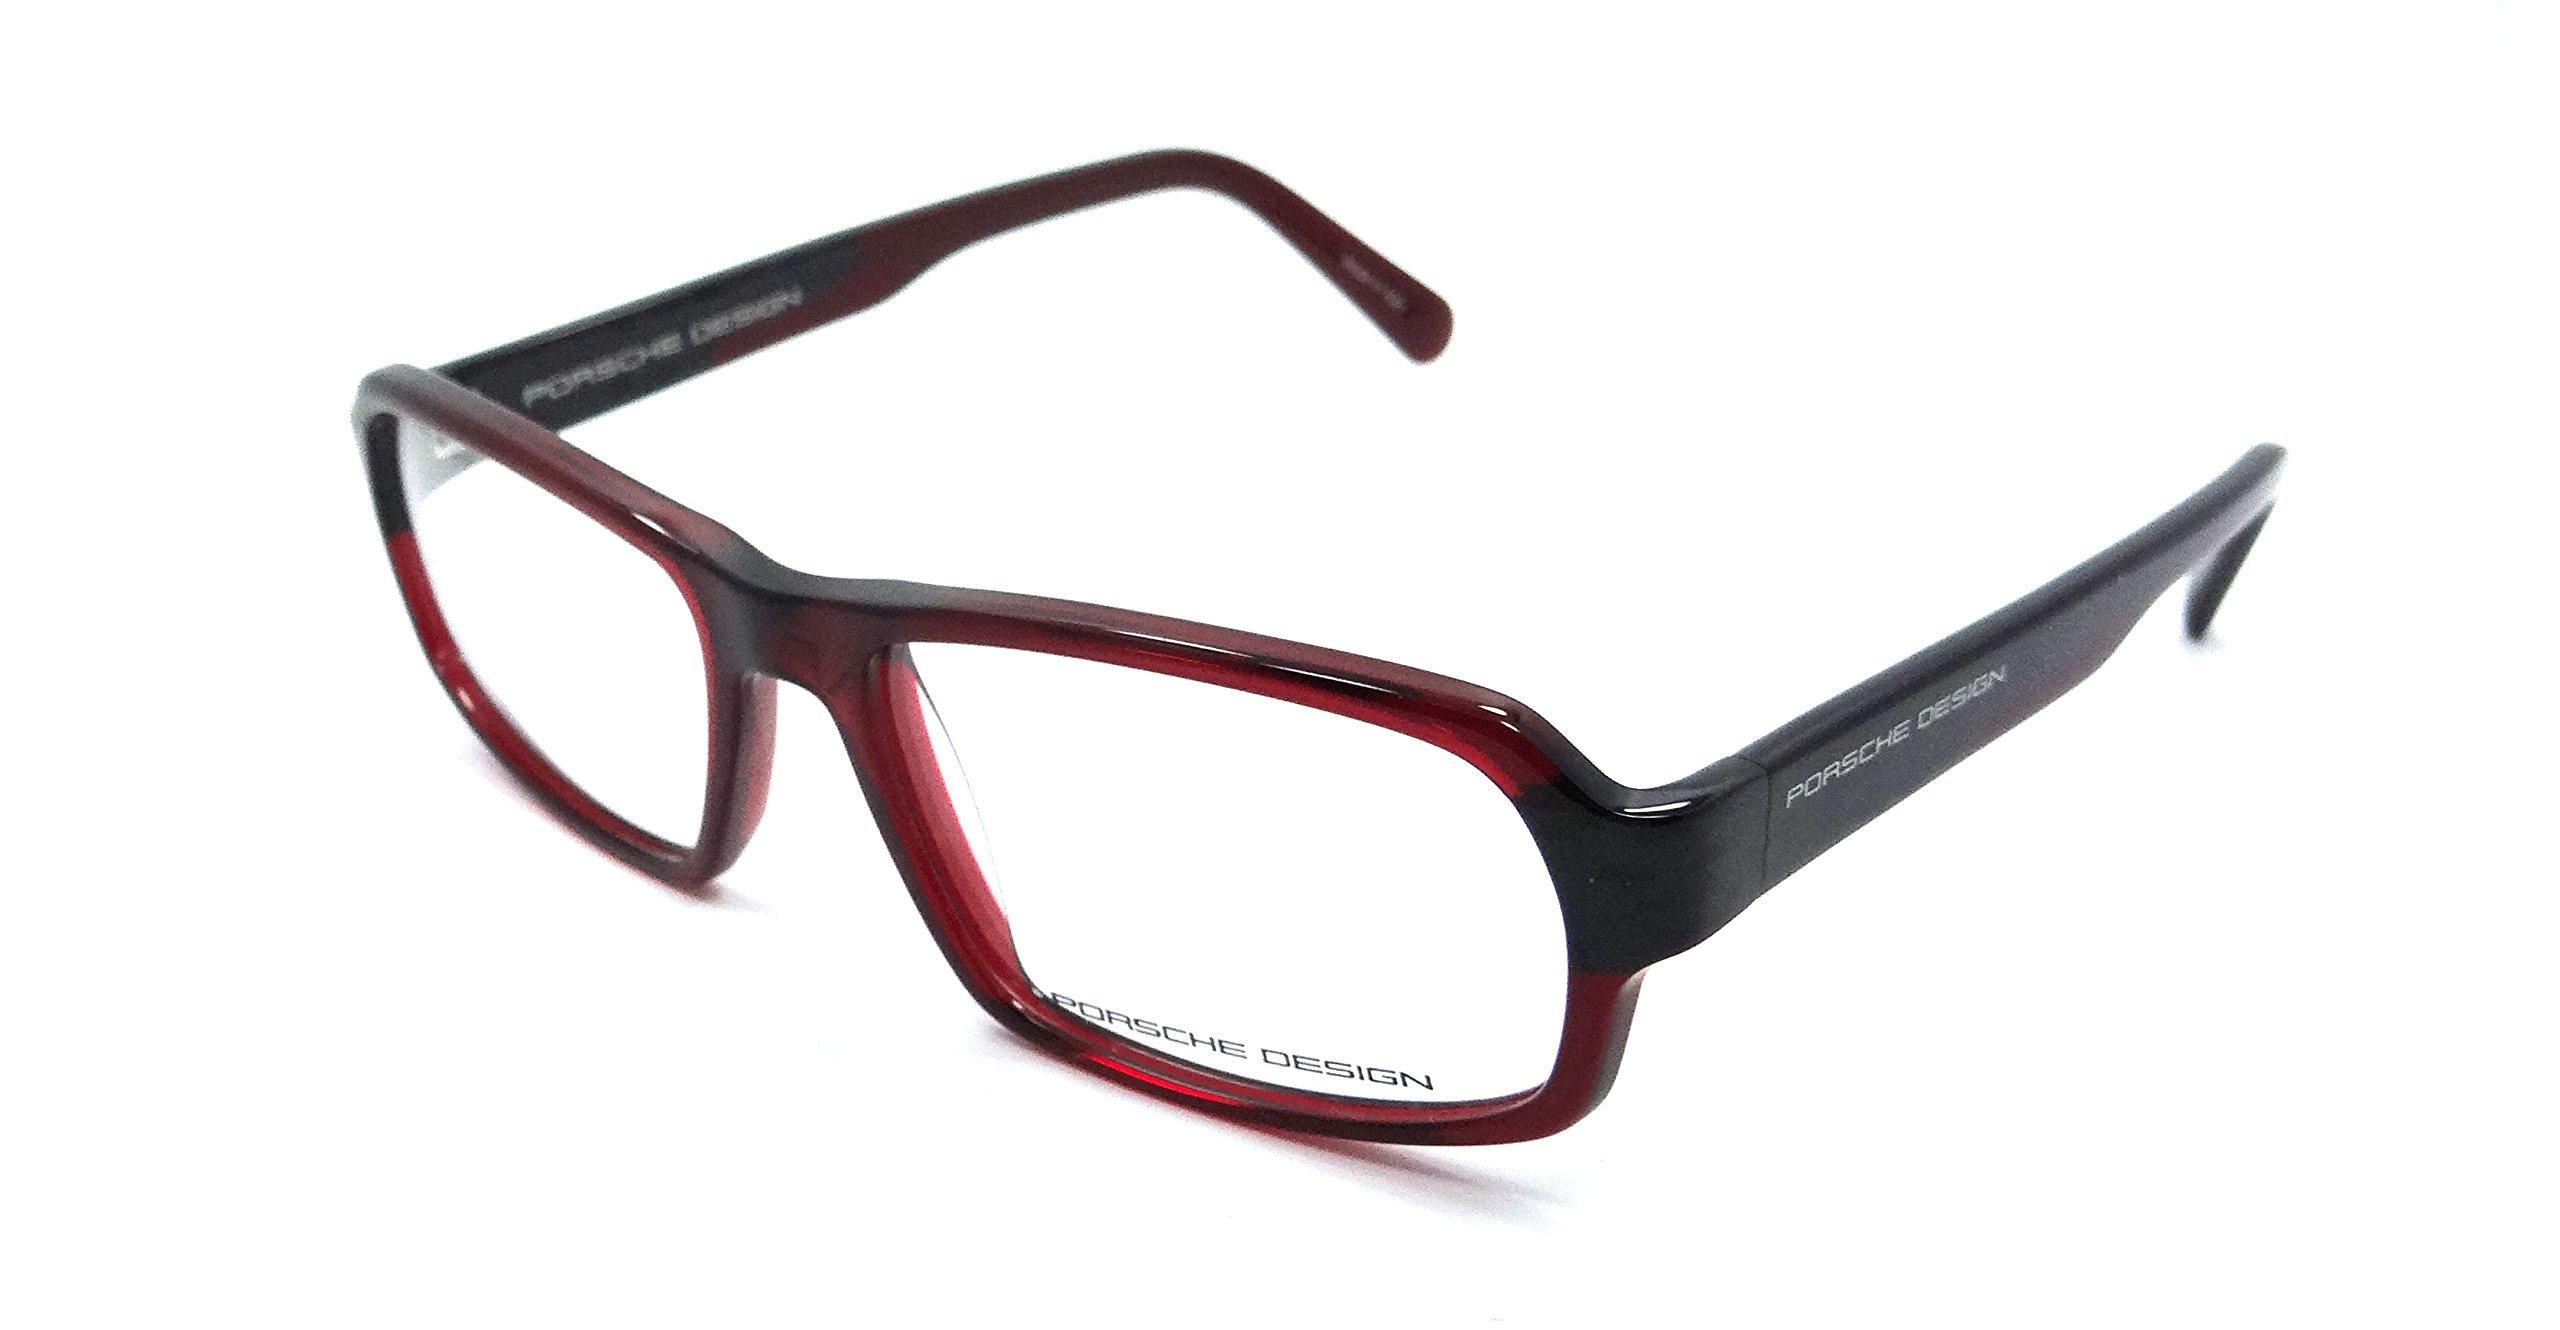 Porsche Design Rx Eyeglasses Frames P8215 D 55x16 Cherry Red Made in Italy